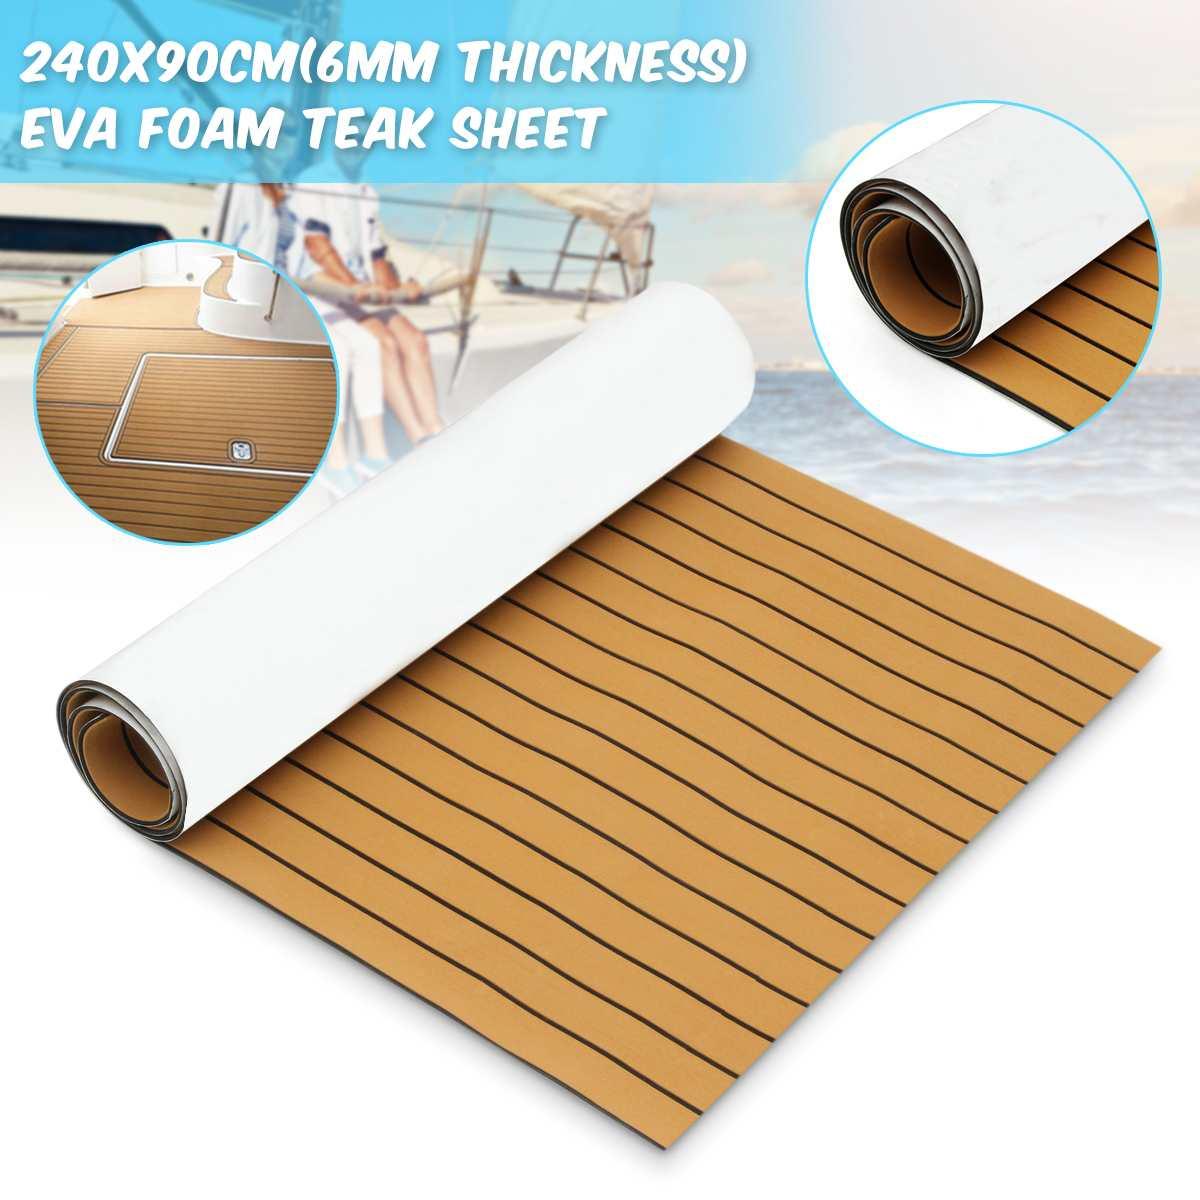 Self-Adhesive 2400x900x5.5mm Gold with Black EVA Foam Teak Boat Flooring Sheet Yacht Synthetic Teak Decking PadSelf-Adhesive 2400x900x5.5mm Gold with Black EVA Foam Teak Boat Flooring Sheet Yacht Synthetic Teak Decking Pad